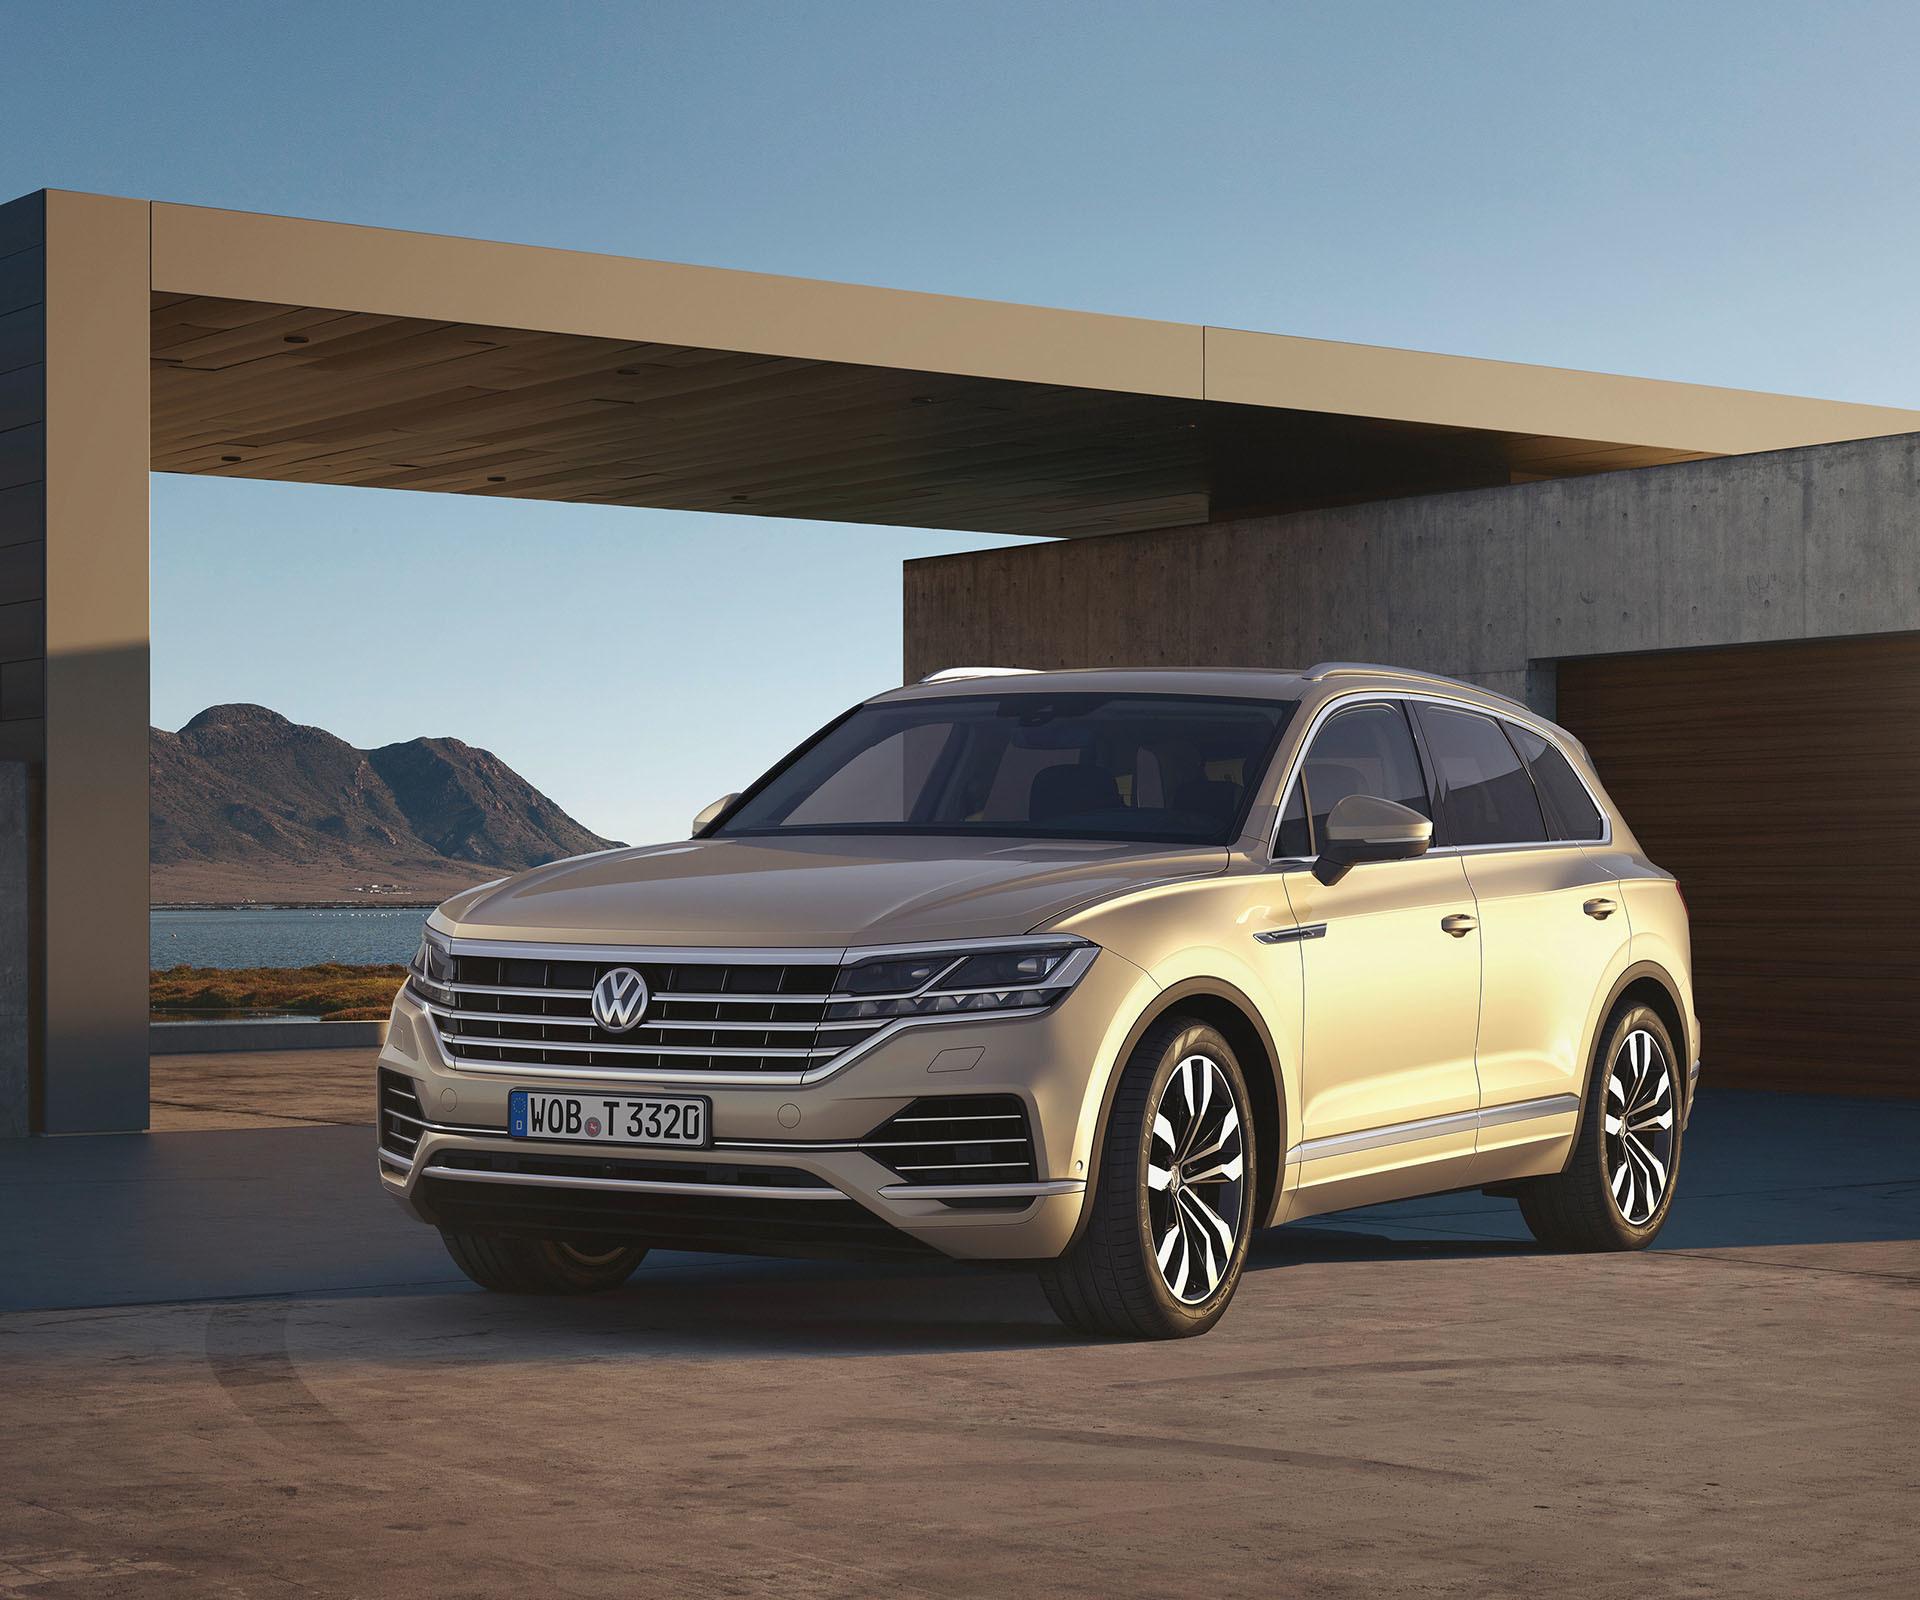 Volkswagen Touareg Portada